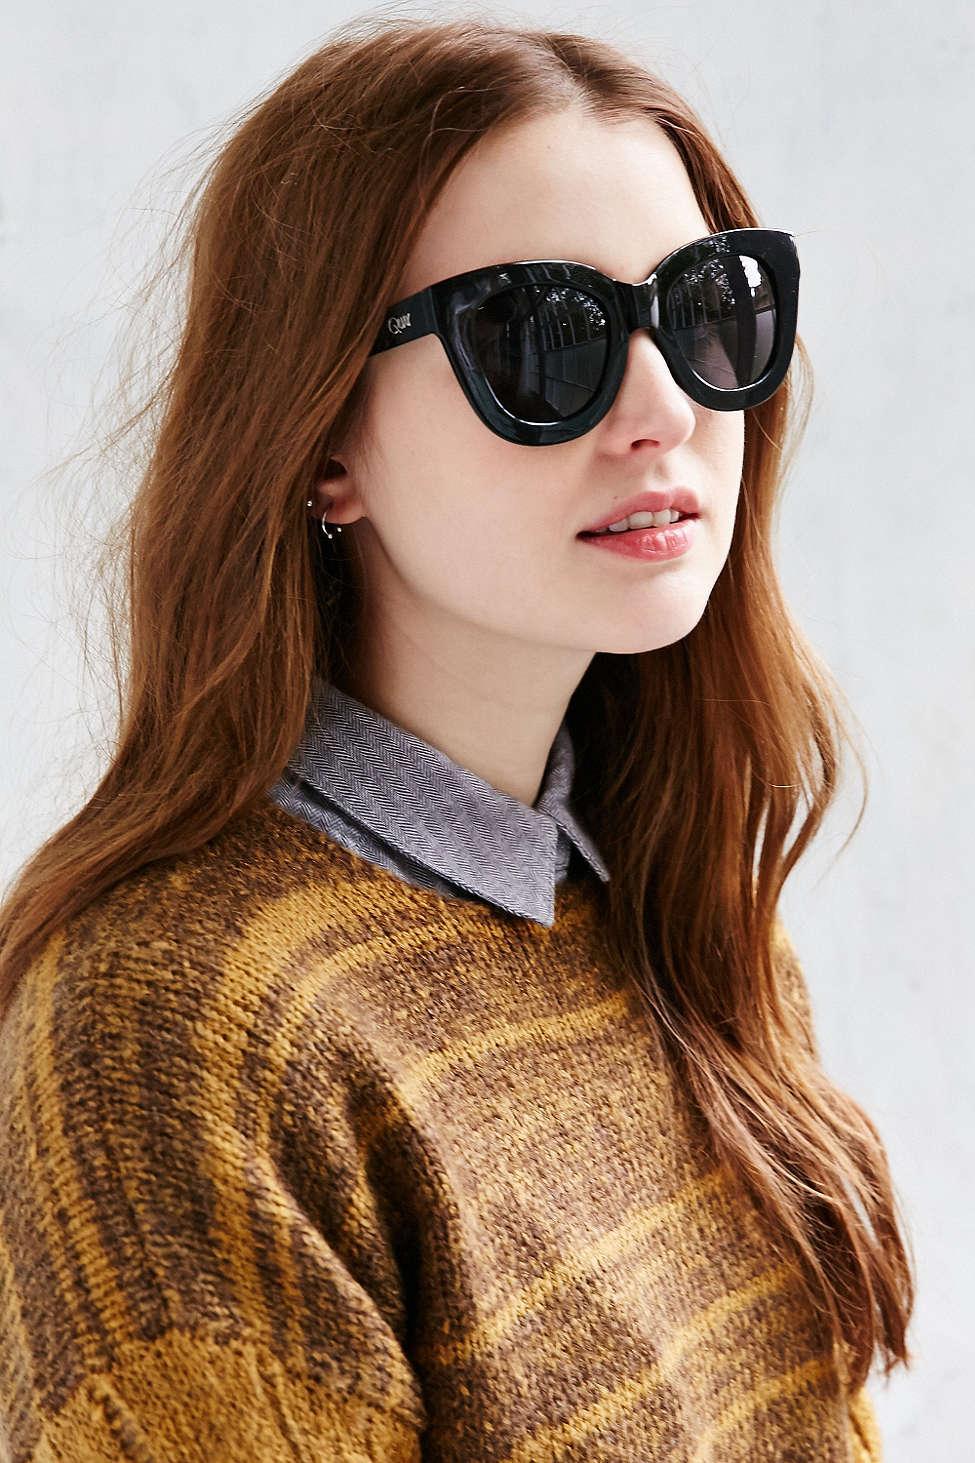 17c0be5b87 Lyst - Quay Sugar + Spice Sunglasses in Black